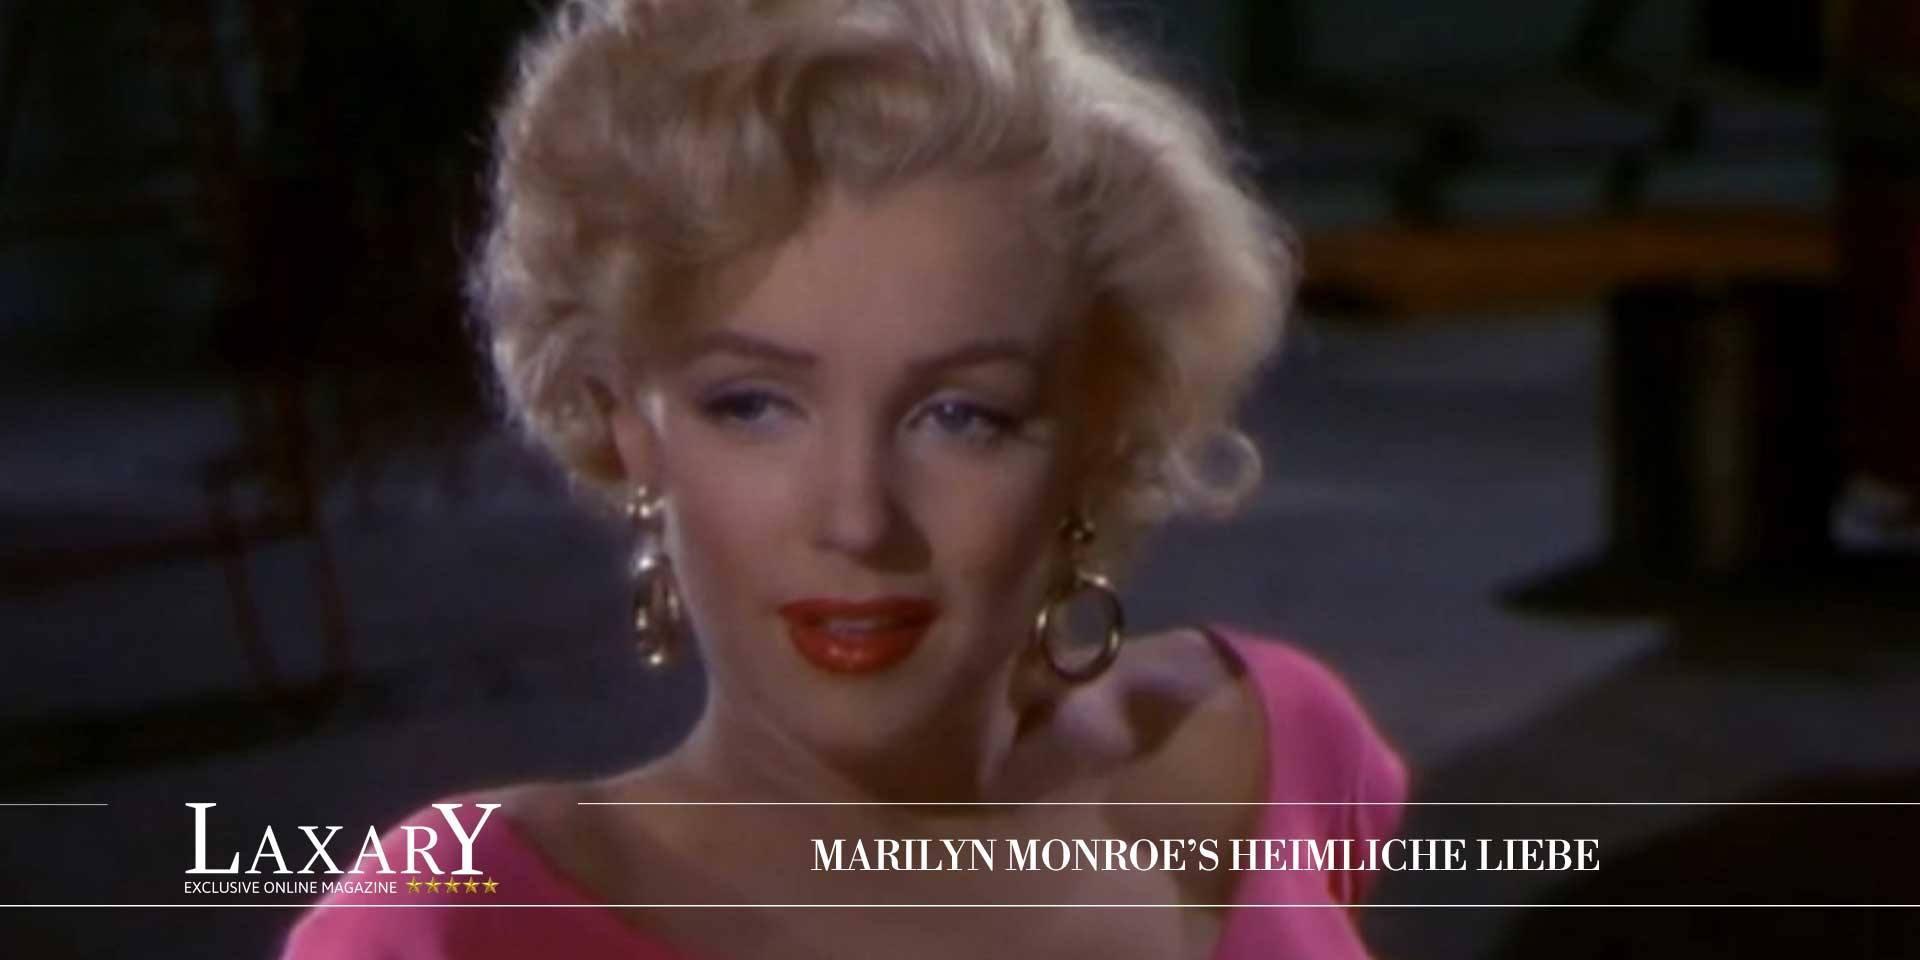 Piper Heidsieck Champagner: Marilyn Monroes heimliche Liebe